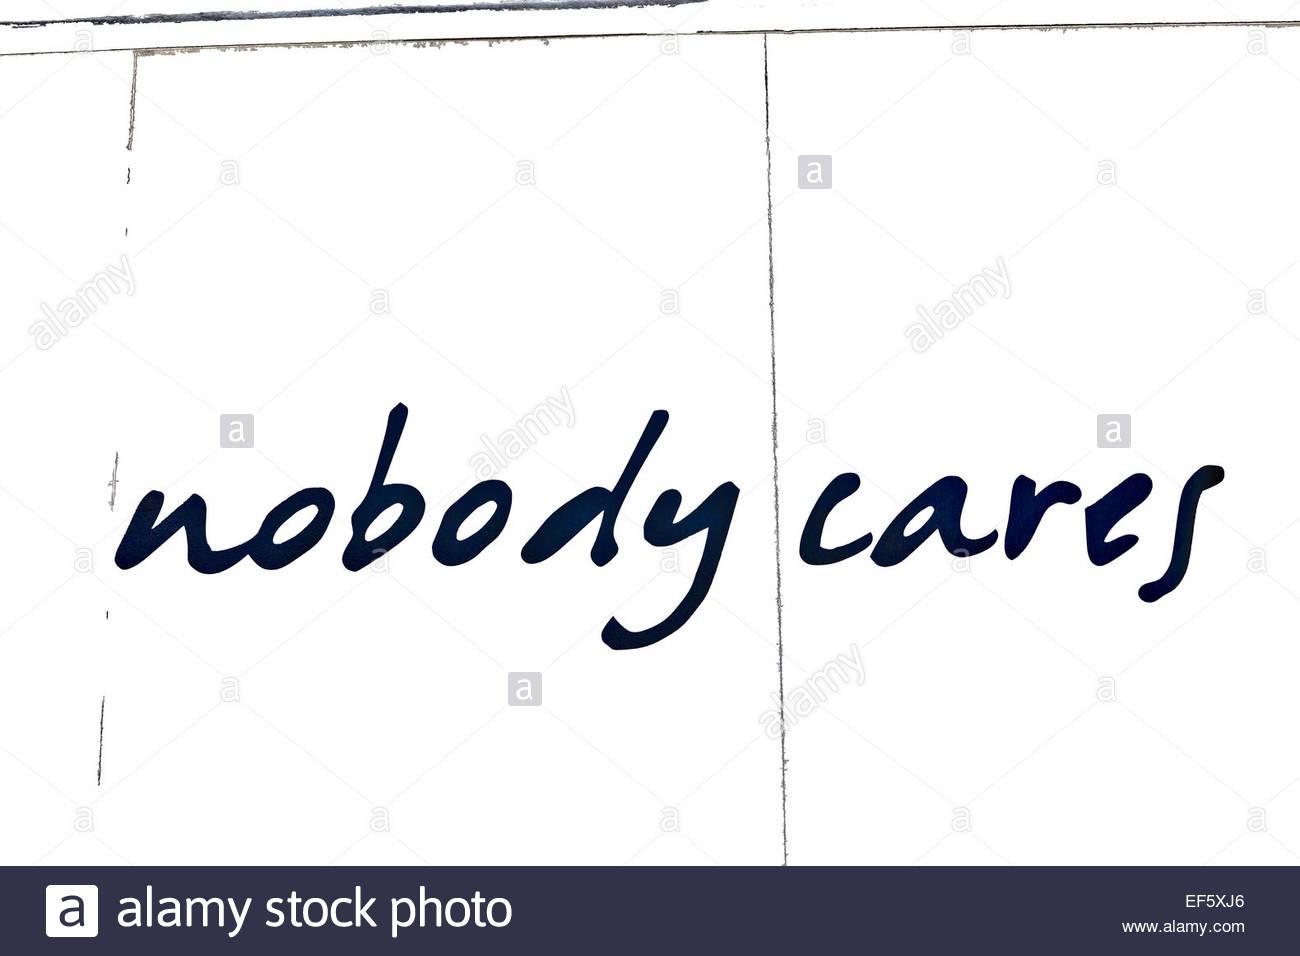 Script writing graffiti black on white: nobody cares - Stock Image